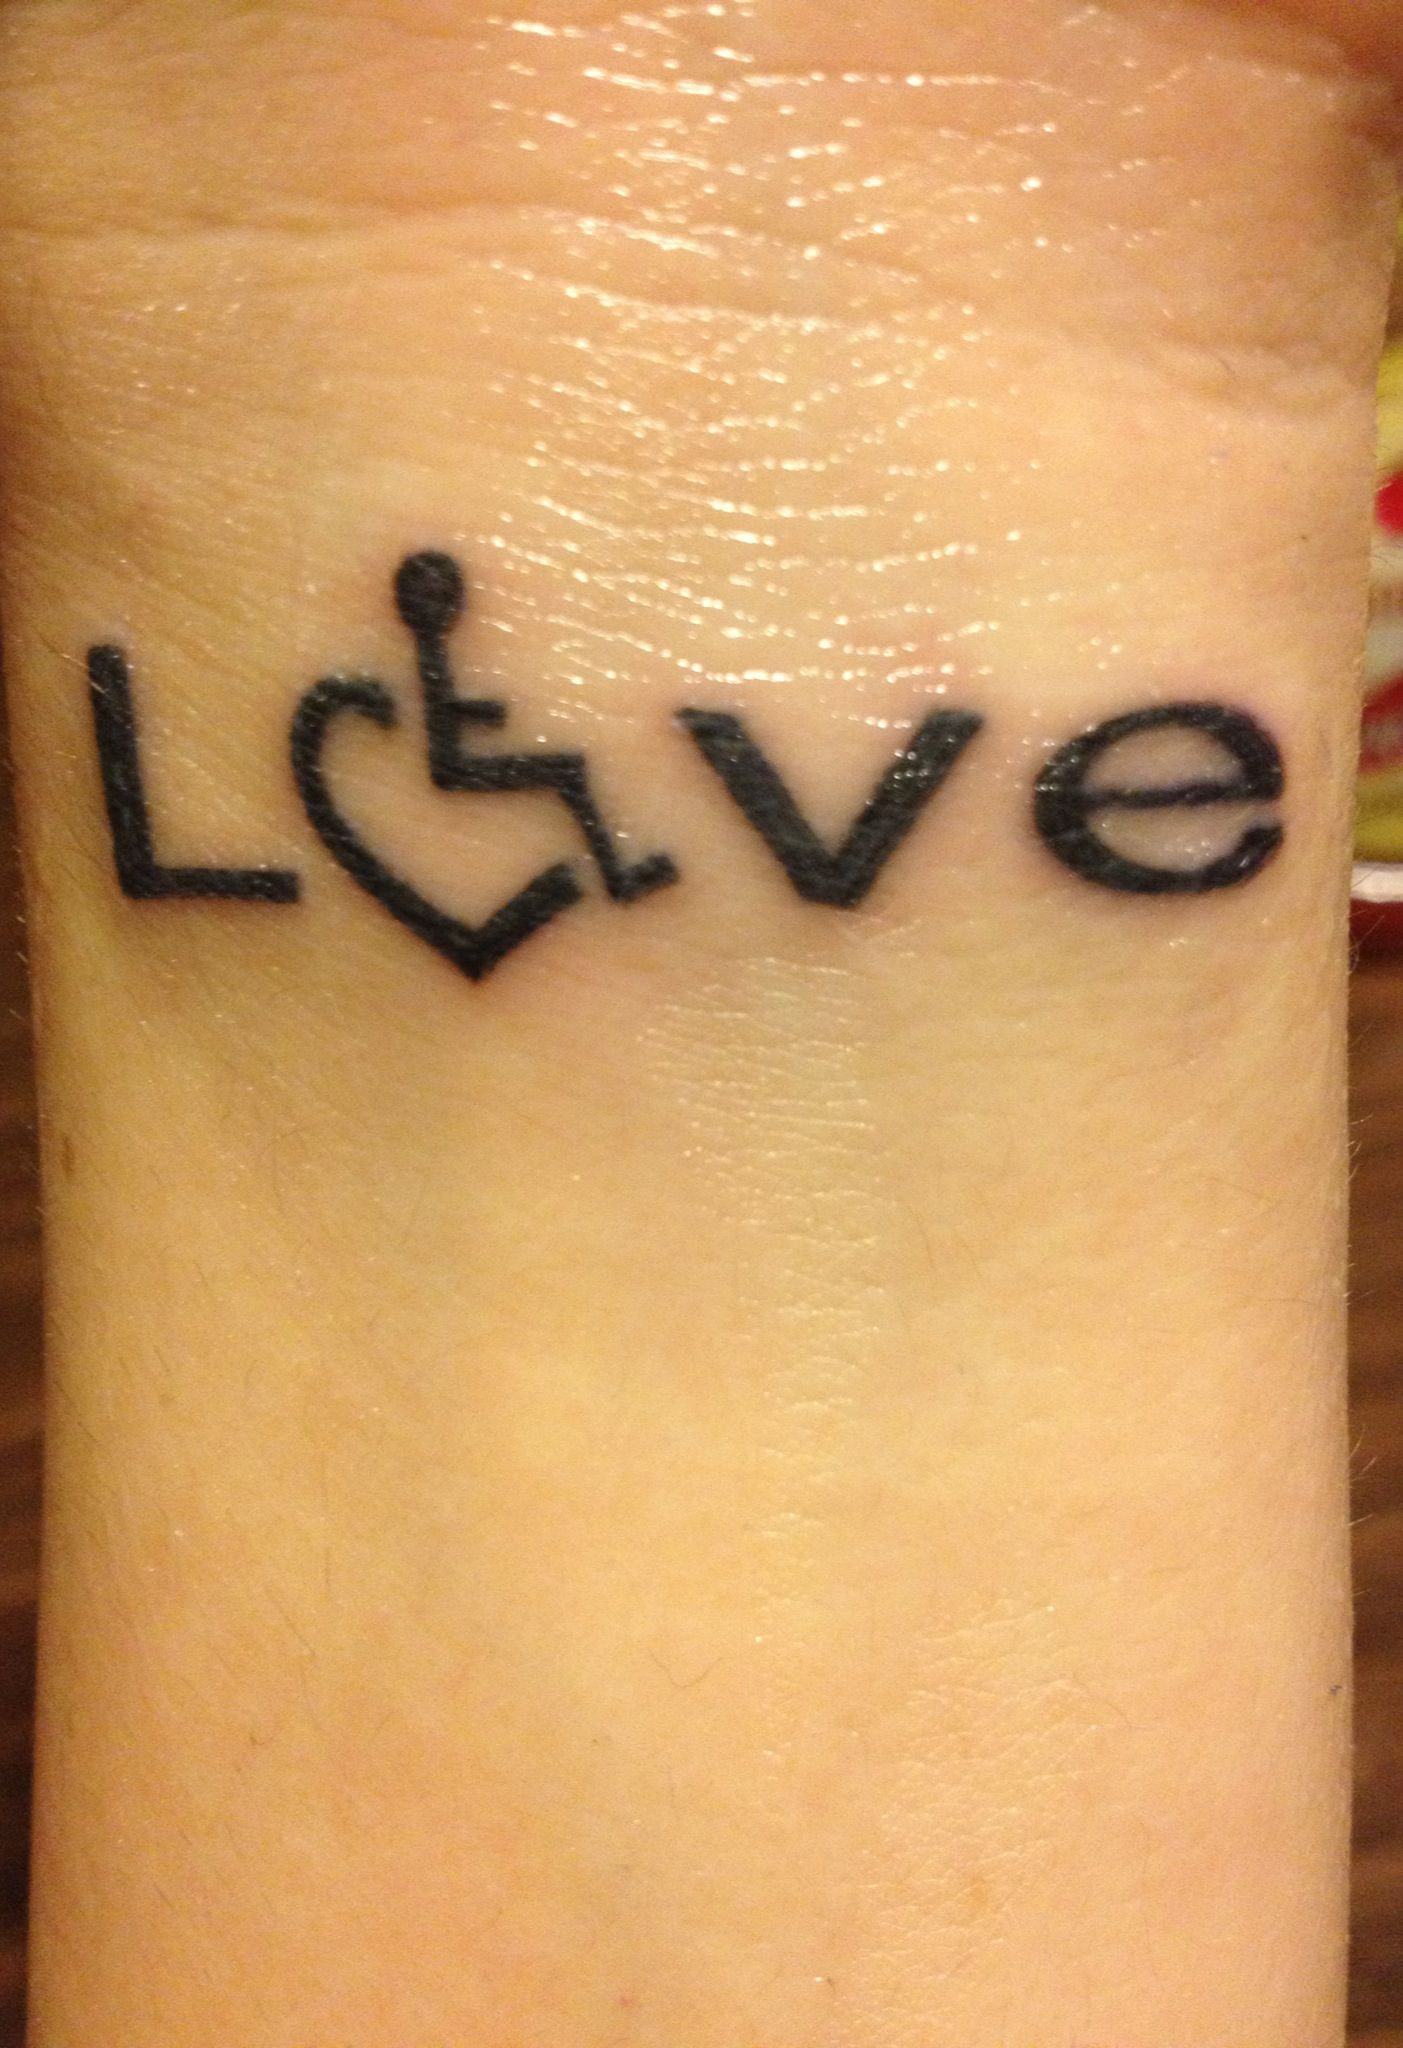 My love wheelchair heart tattoo i got for my daughter who has my love wheelchair heart tattoo i got for my daughter who has spinal muscular atrophy type buycottarizona